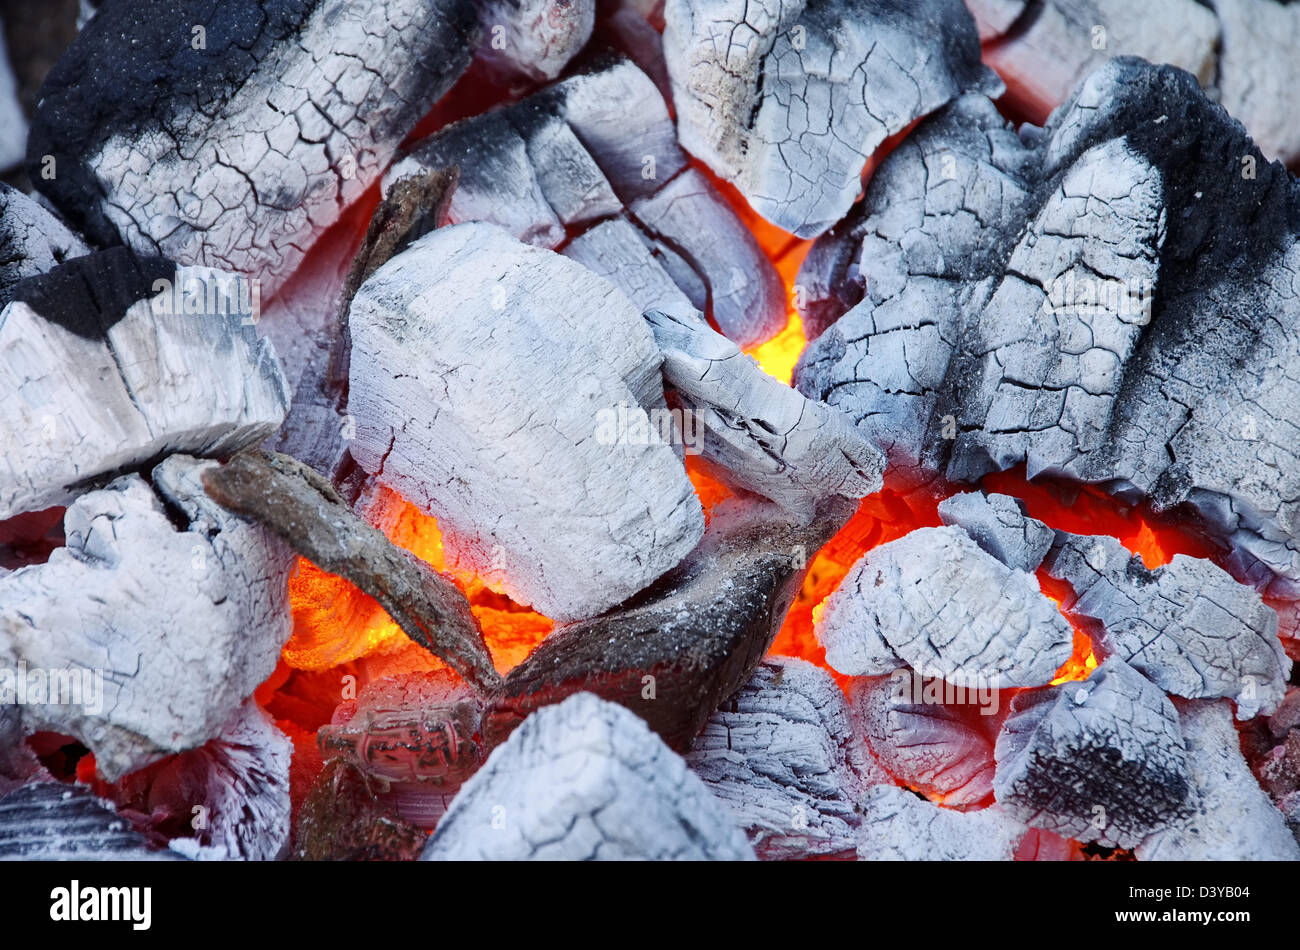 Holzkohle - Carbone 18 Immagini Stock